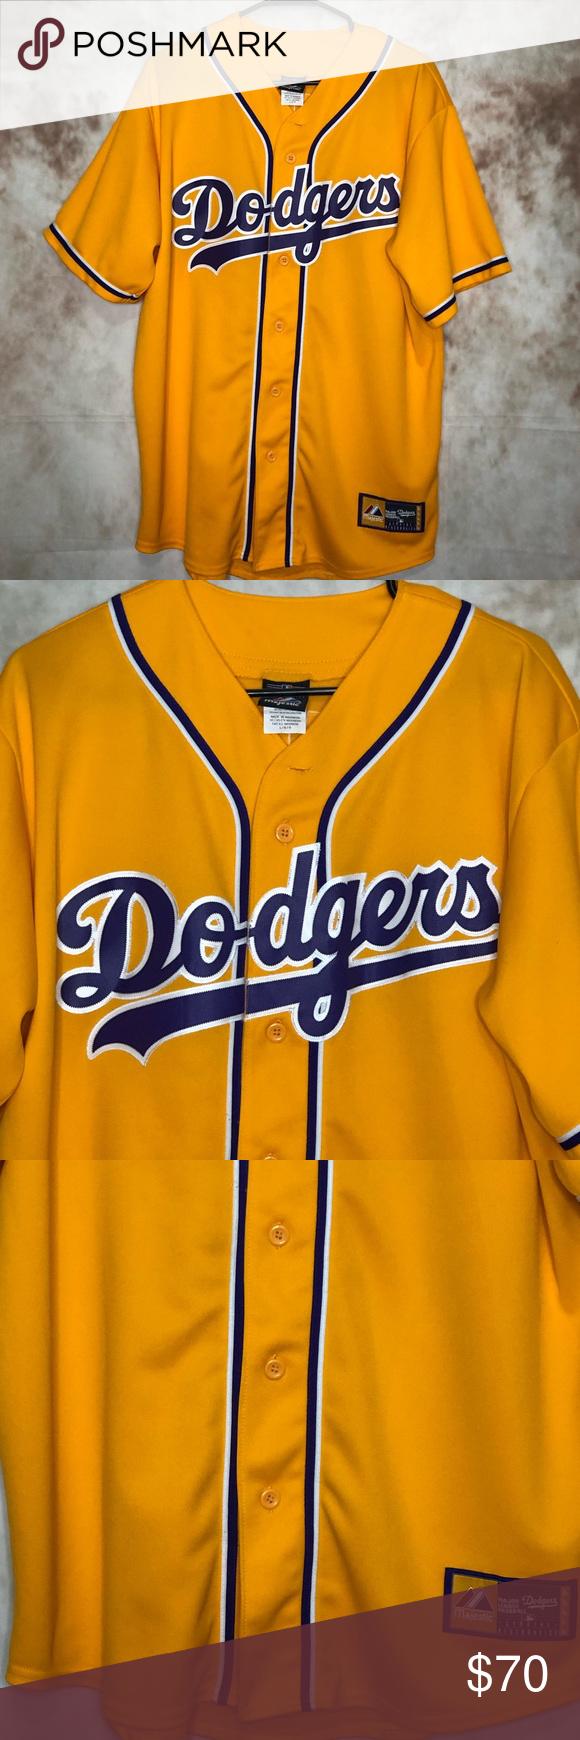 Dodgers Ramirez Jersey #99 men's Large Dodgers jersey by Majestic